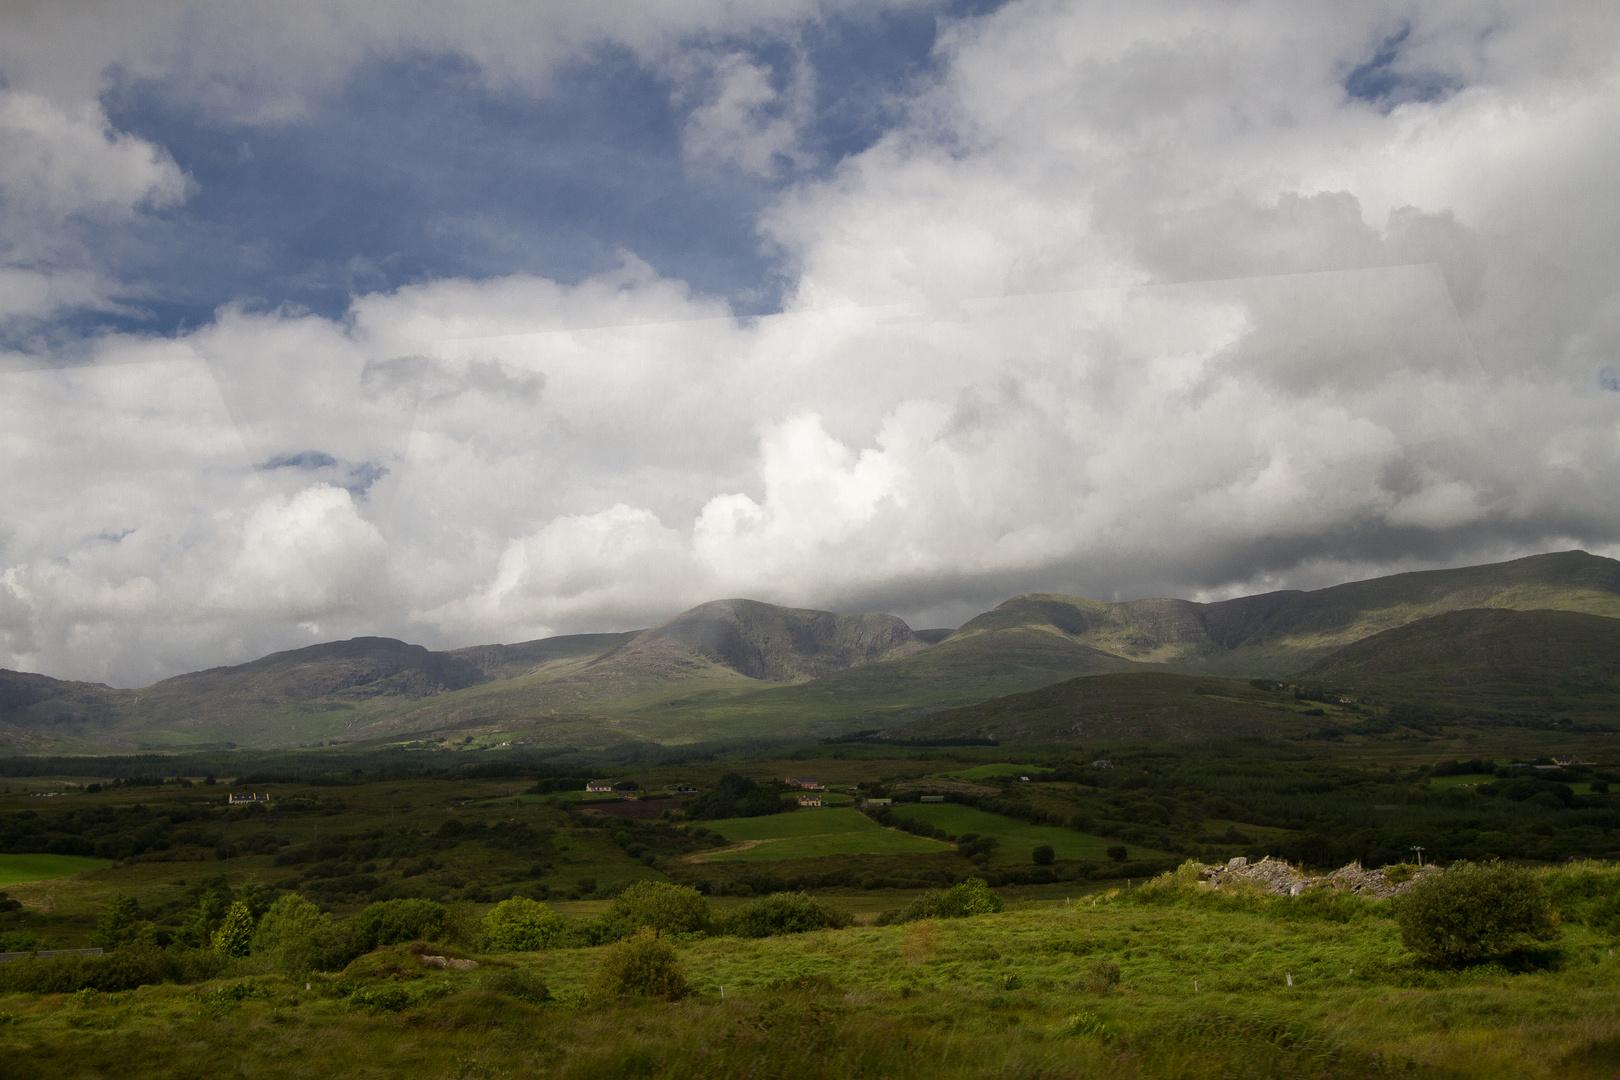 Irland, Impression